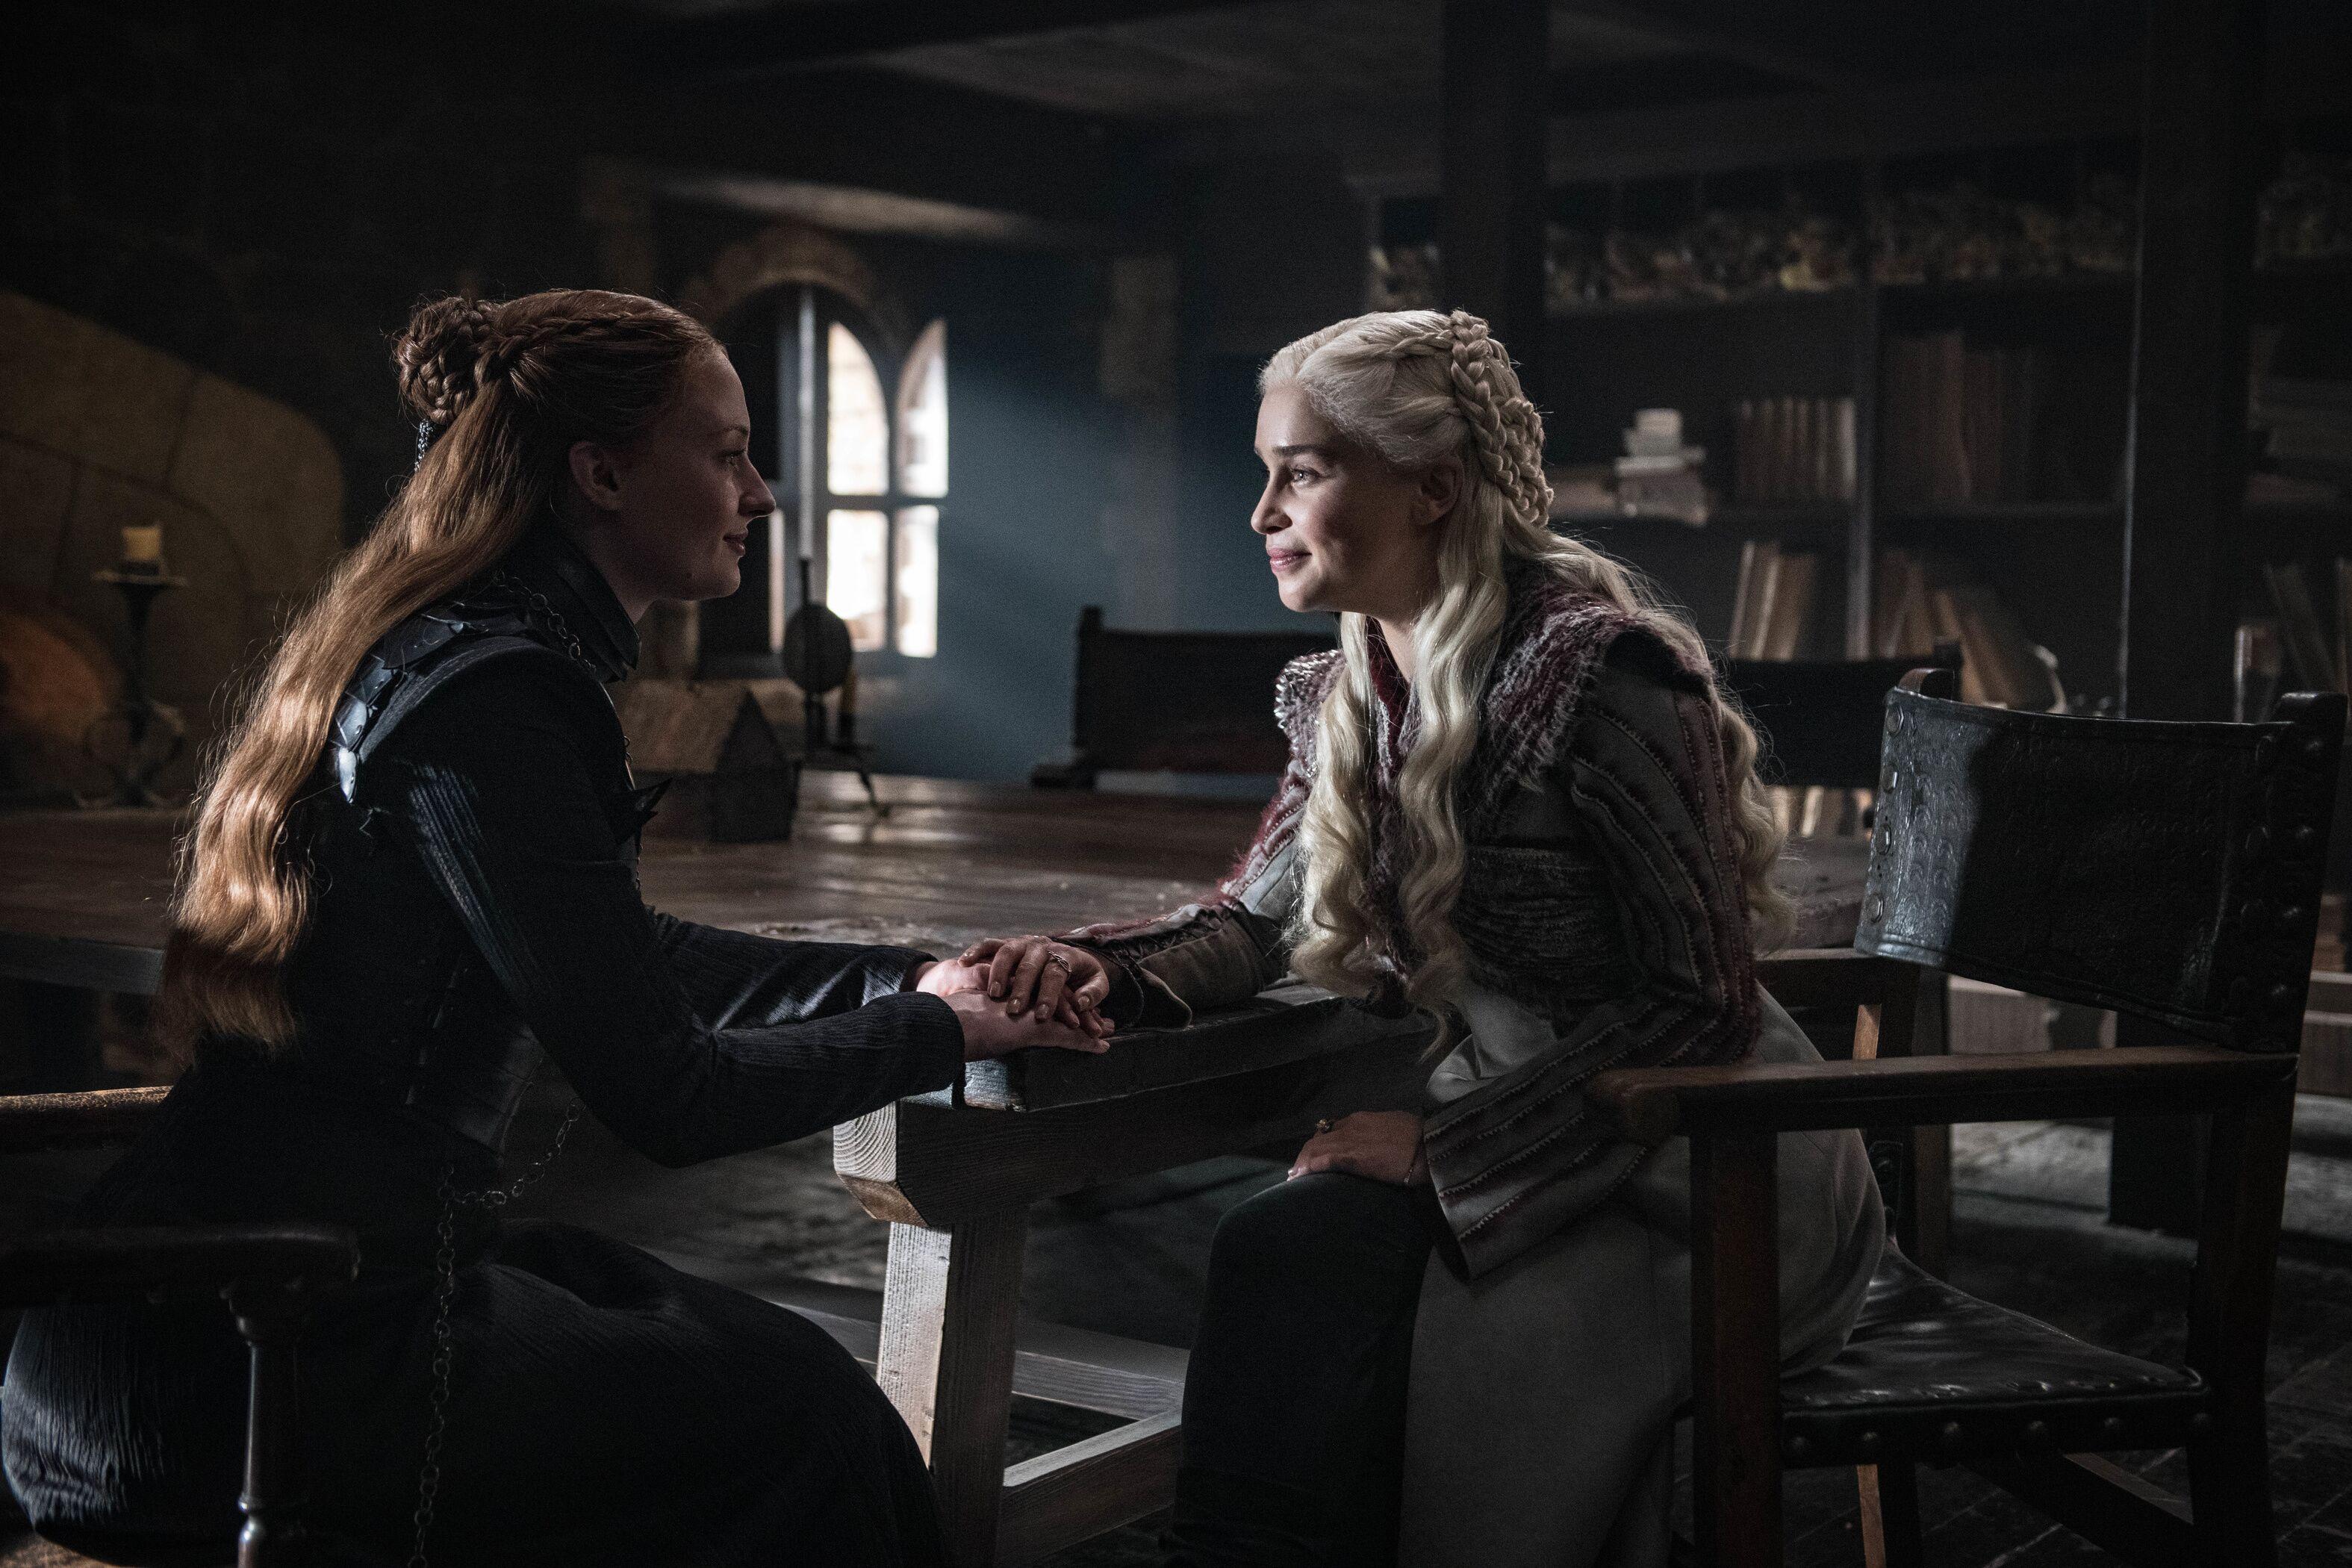 Game of Thrones' viewership takes dip from final season debut